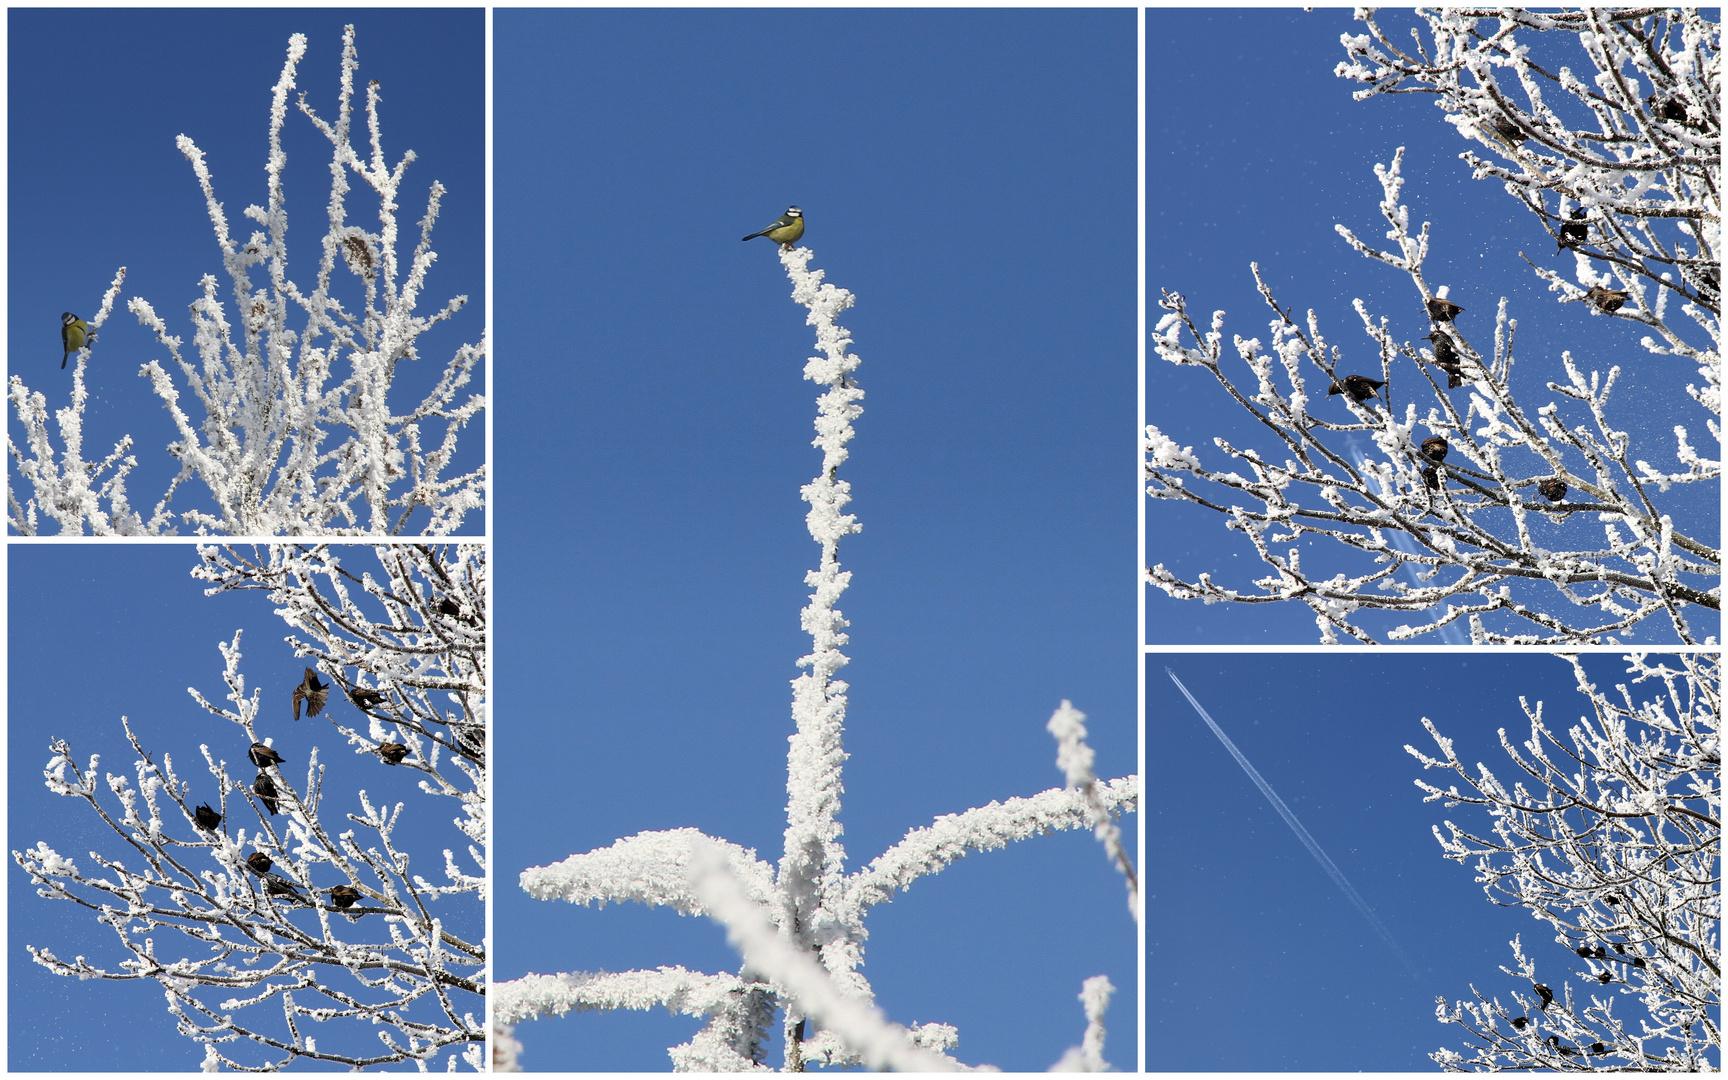 bleu , bleu ... le ciel de l'hiver ...blanc ...blanc... etc ...